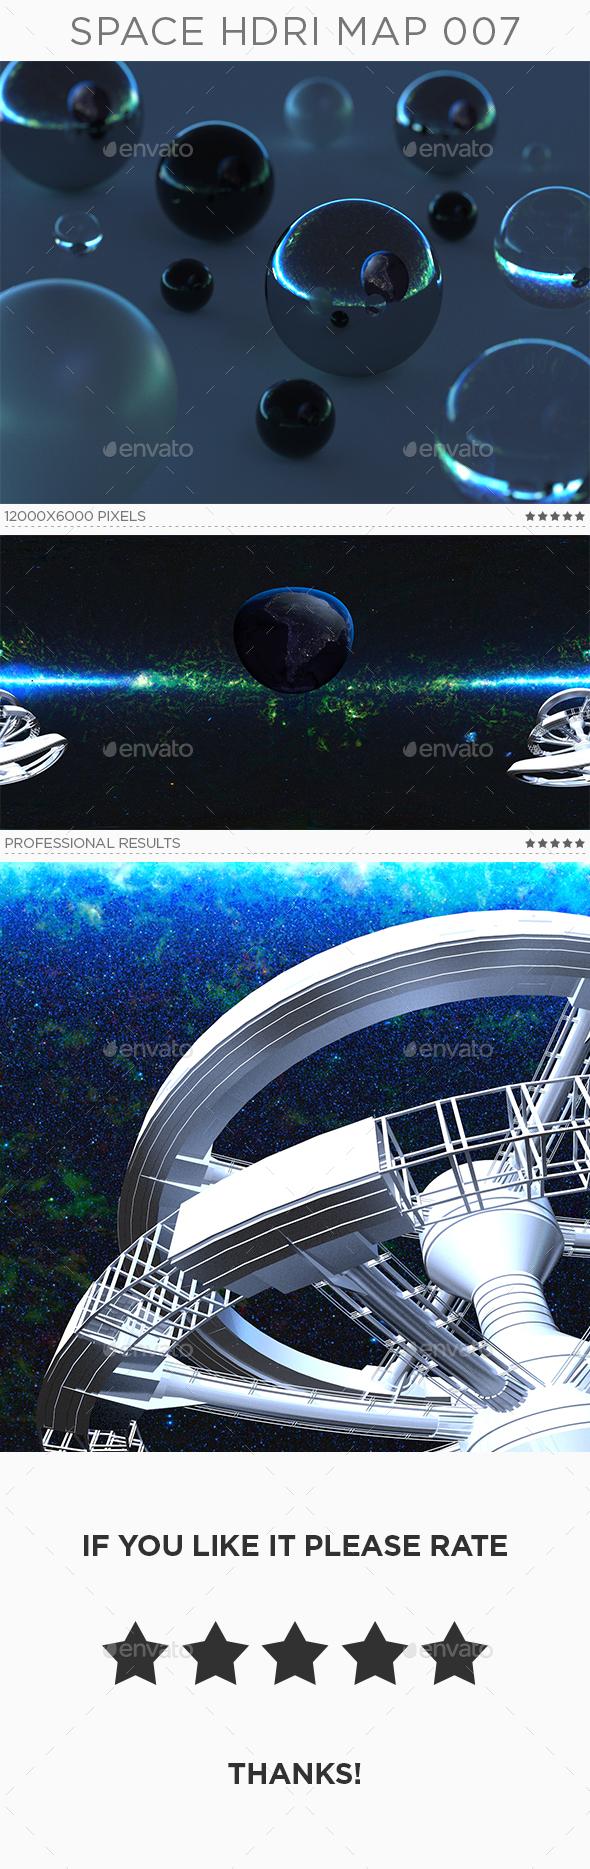 Space HDRi Map 007 - 3DOcean Item for Sale